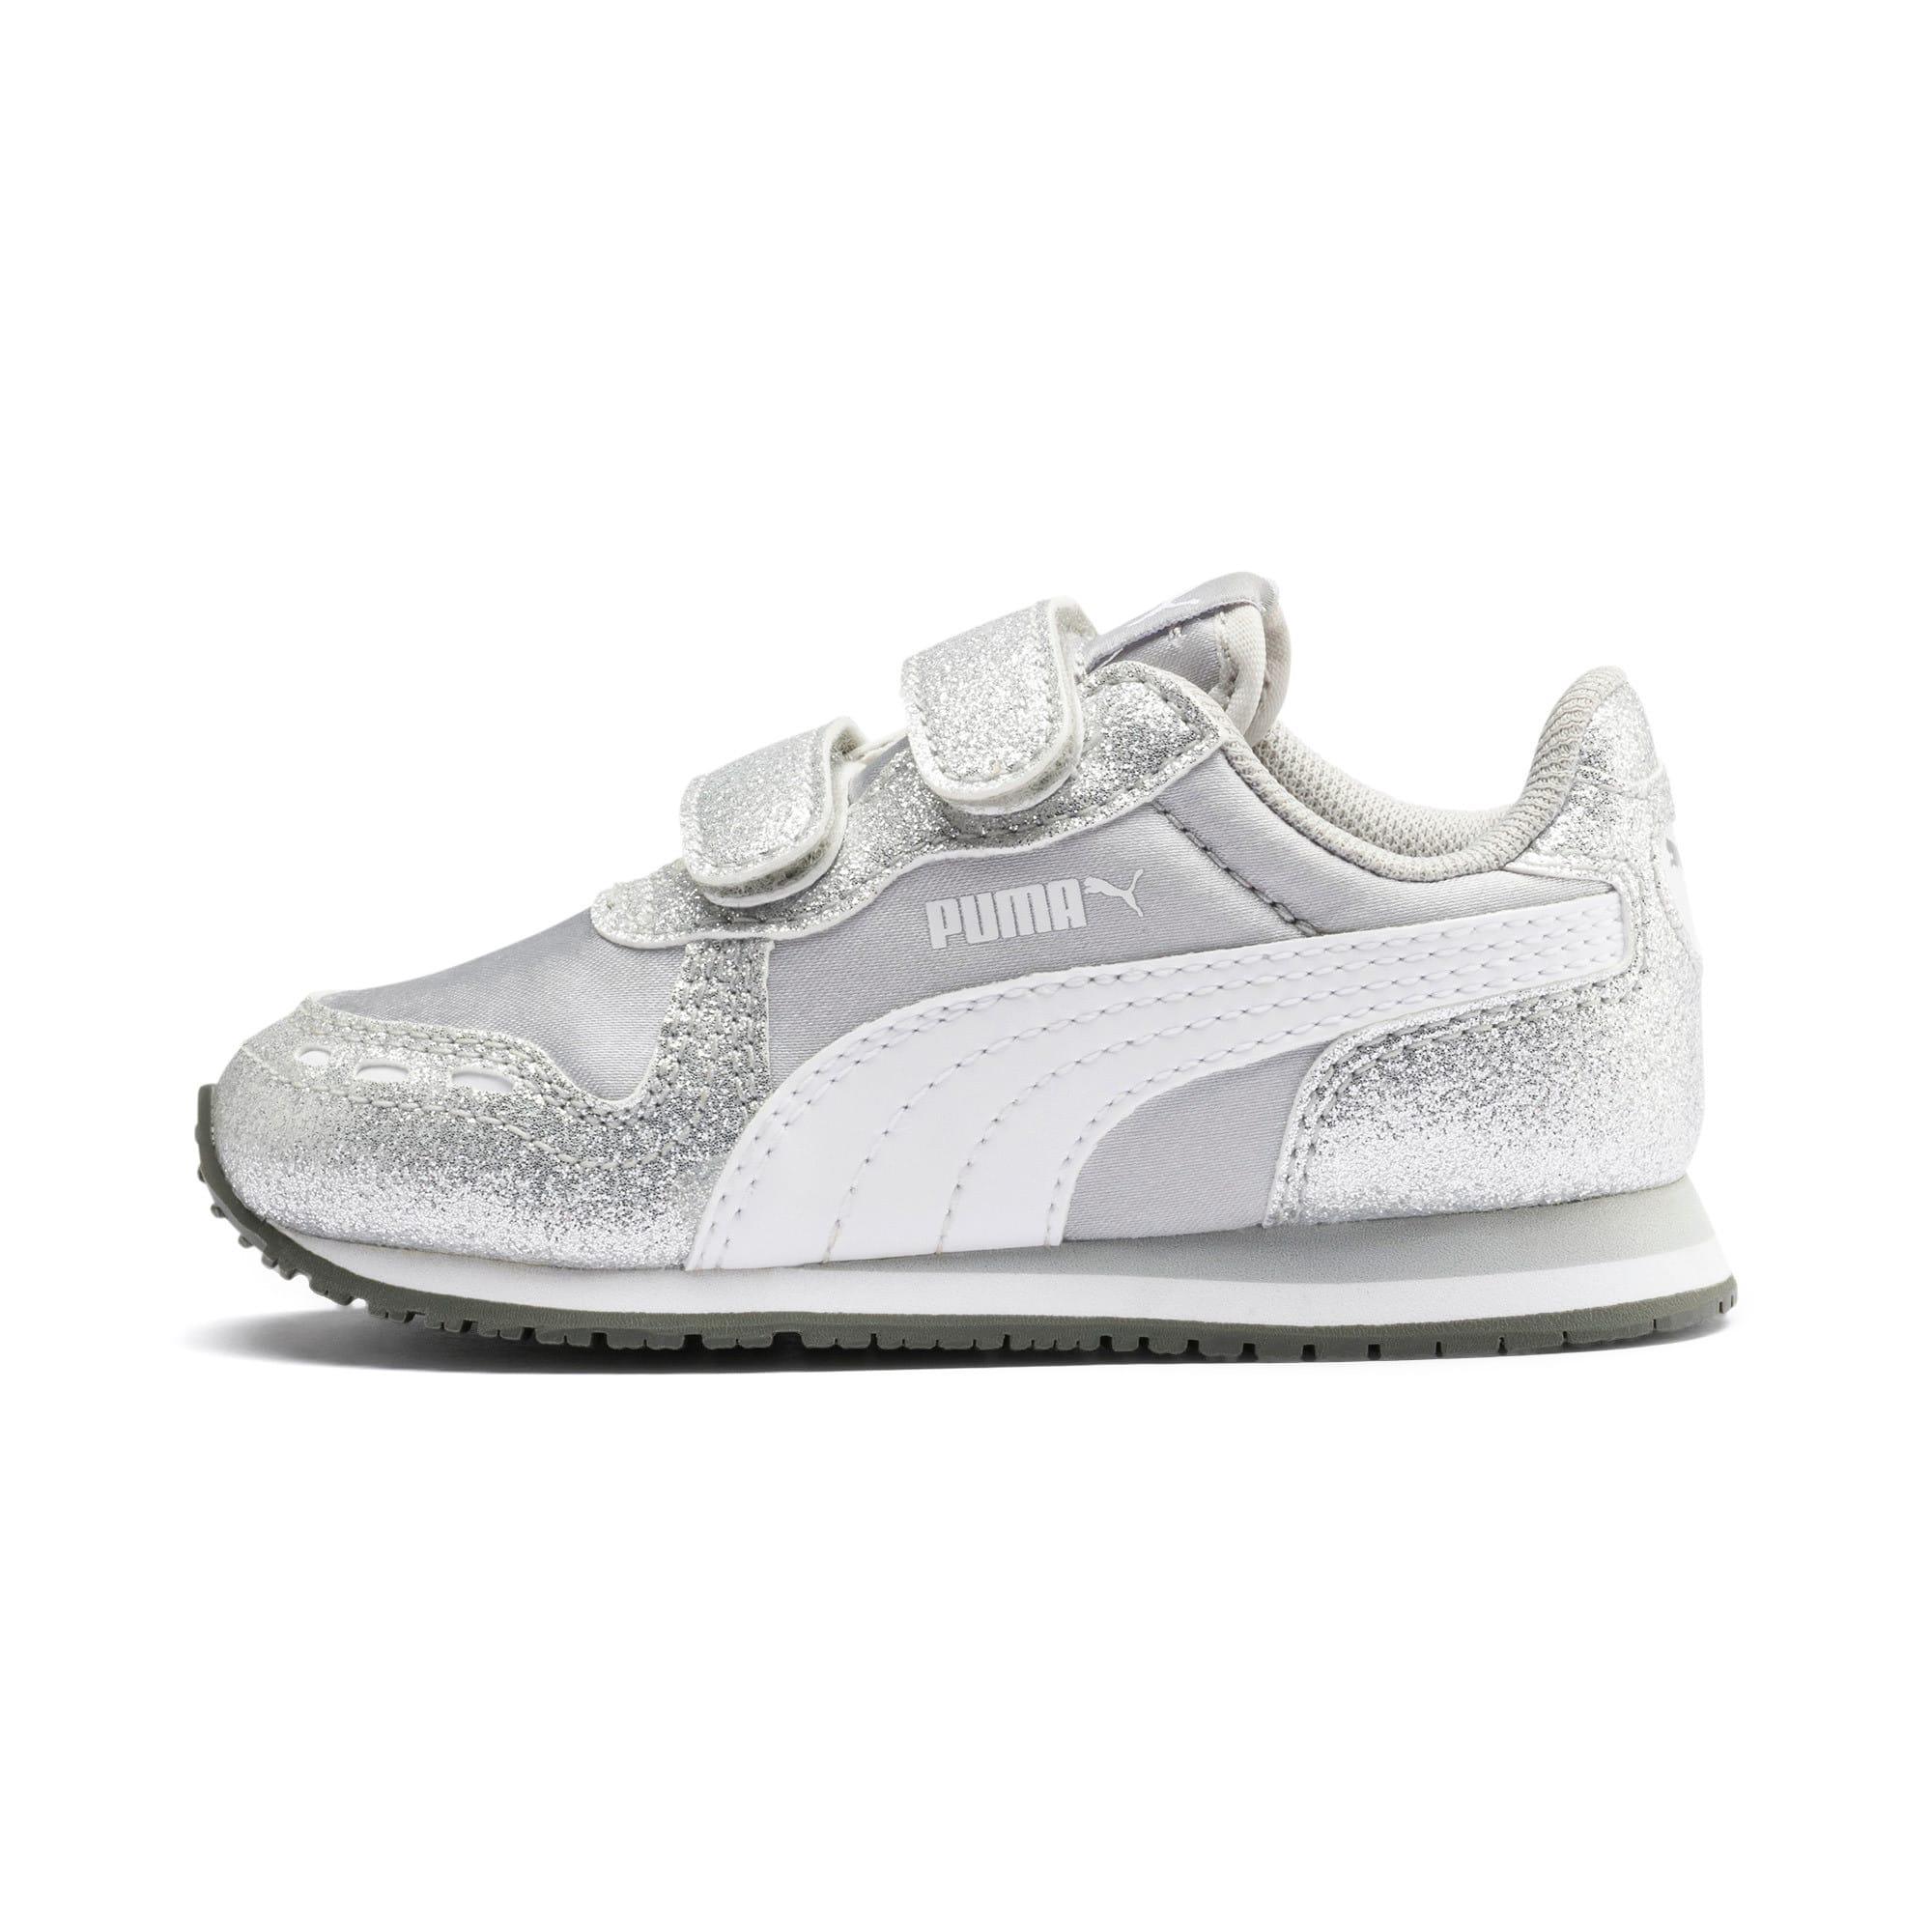 Thumbnail 1 of Cabana Racer Glitz AC Shoes INF, Puma Silver-Puma White, medium